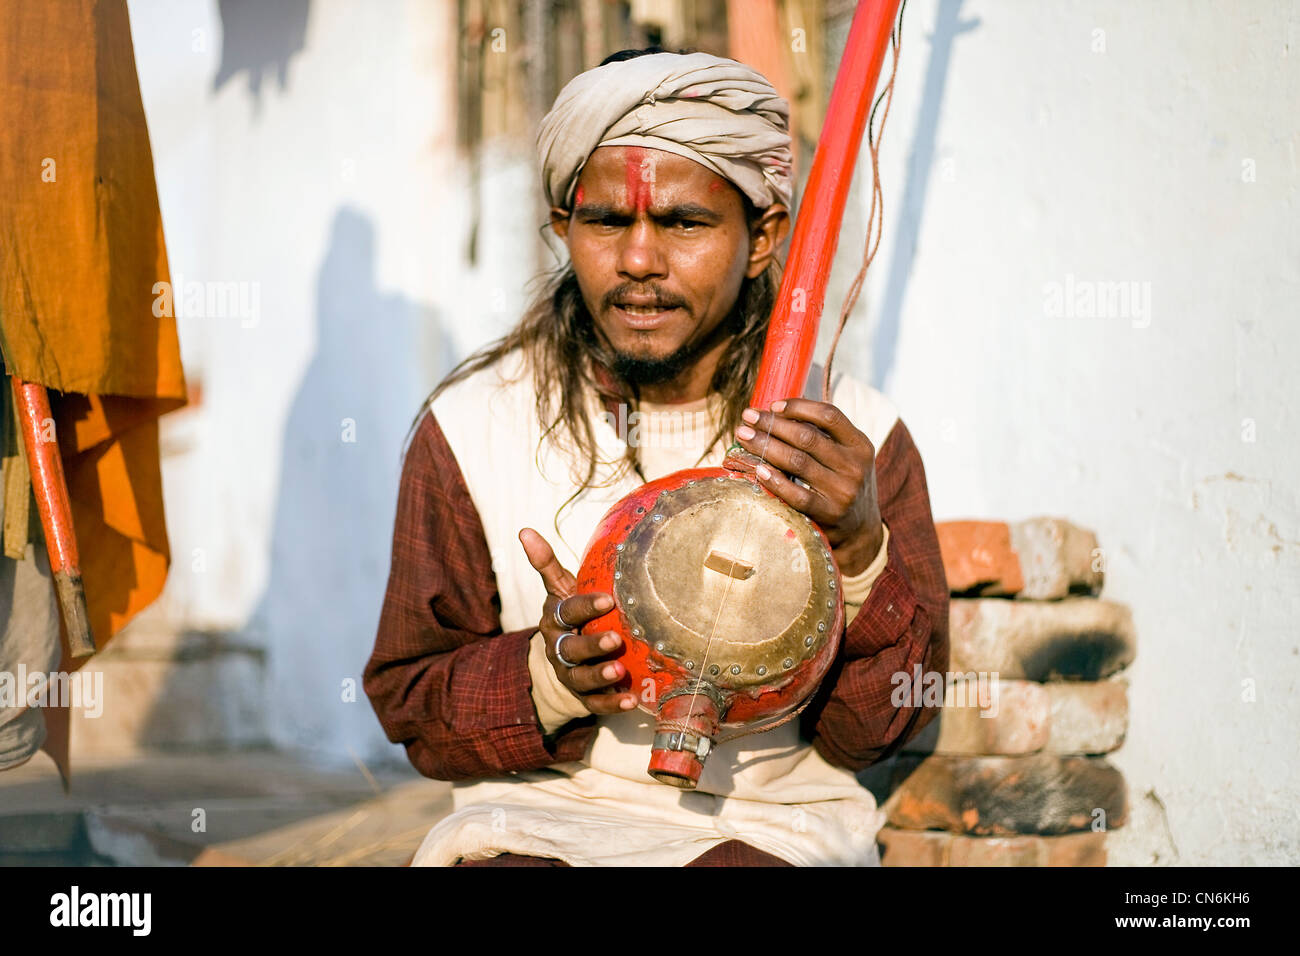 Sadhu musician performing during Pushkar Camel fair - Stock Image